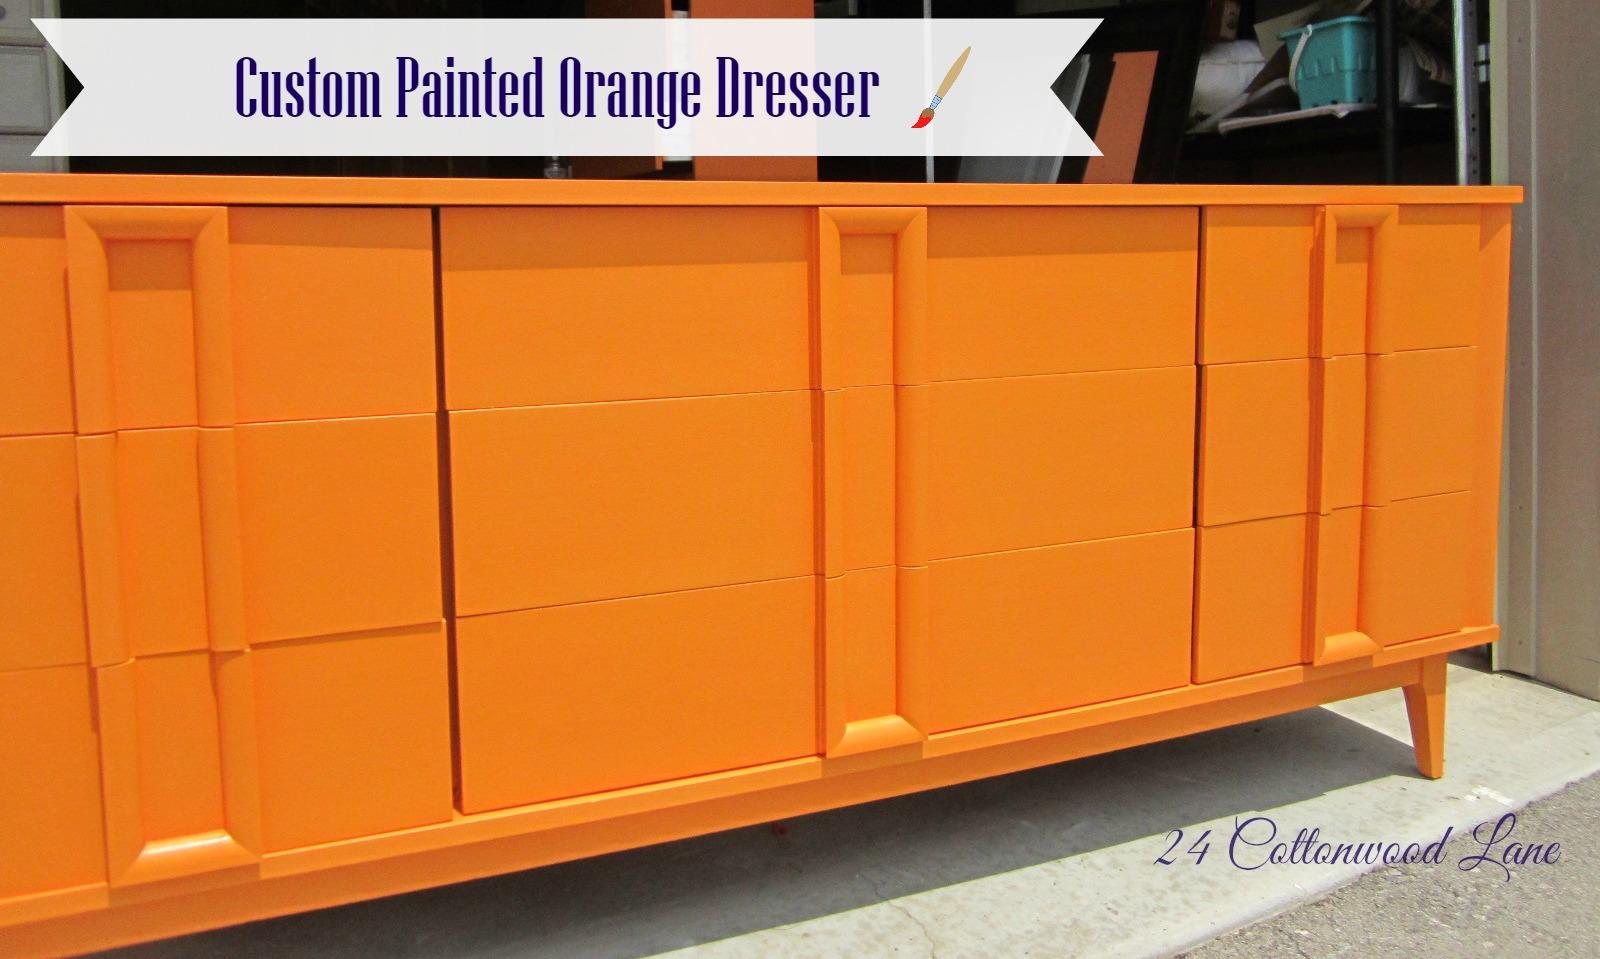 the groovy orange dresser - share